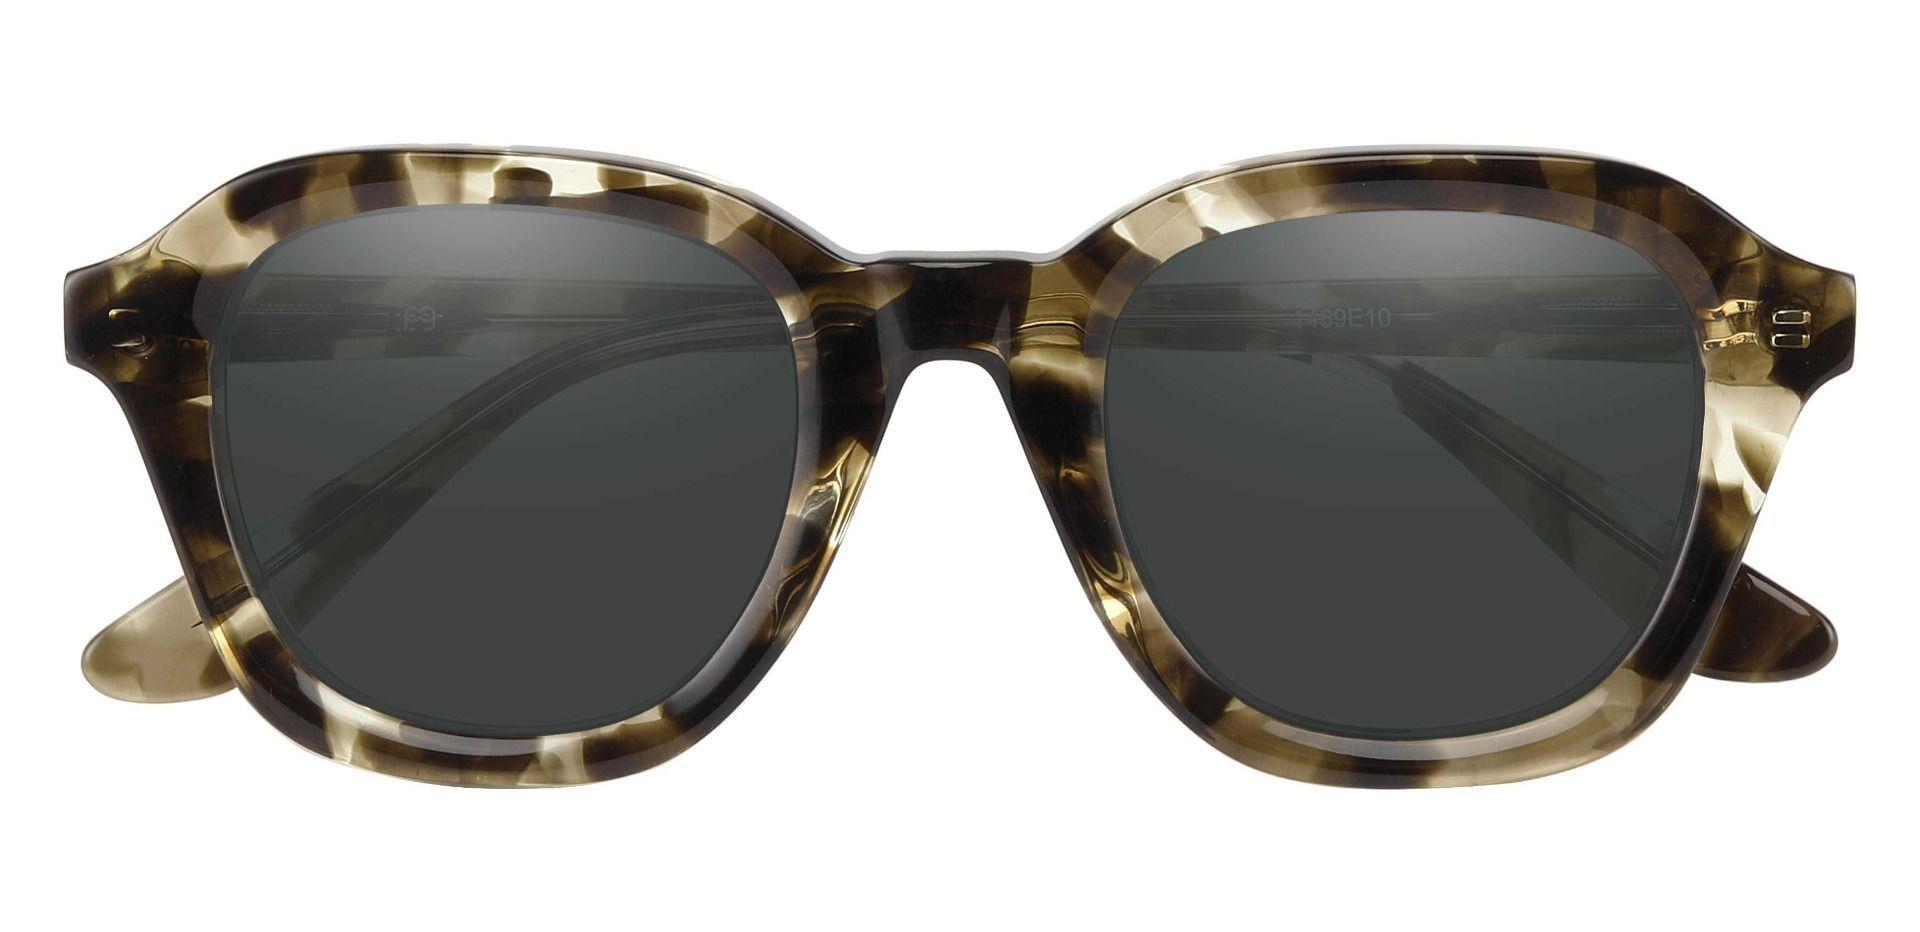 Grove Square Prescription Sunglasses - Green Frame With Gray Lenses